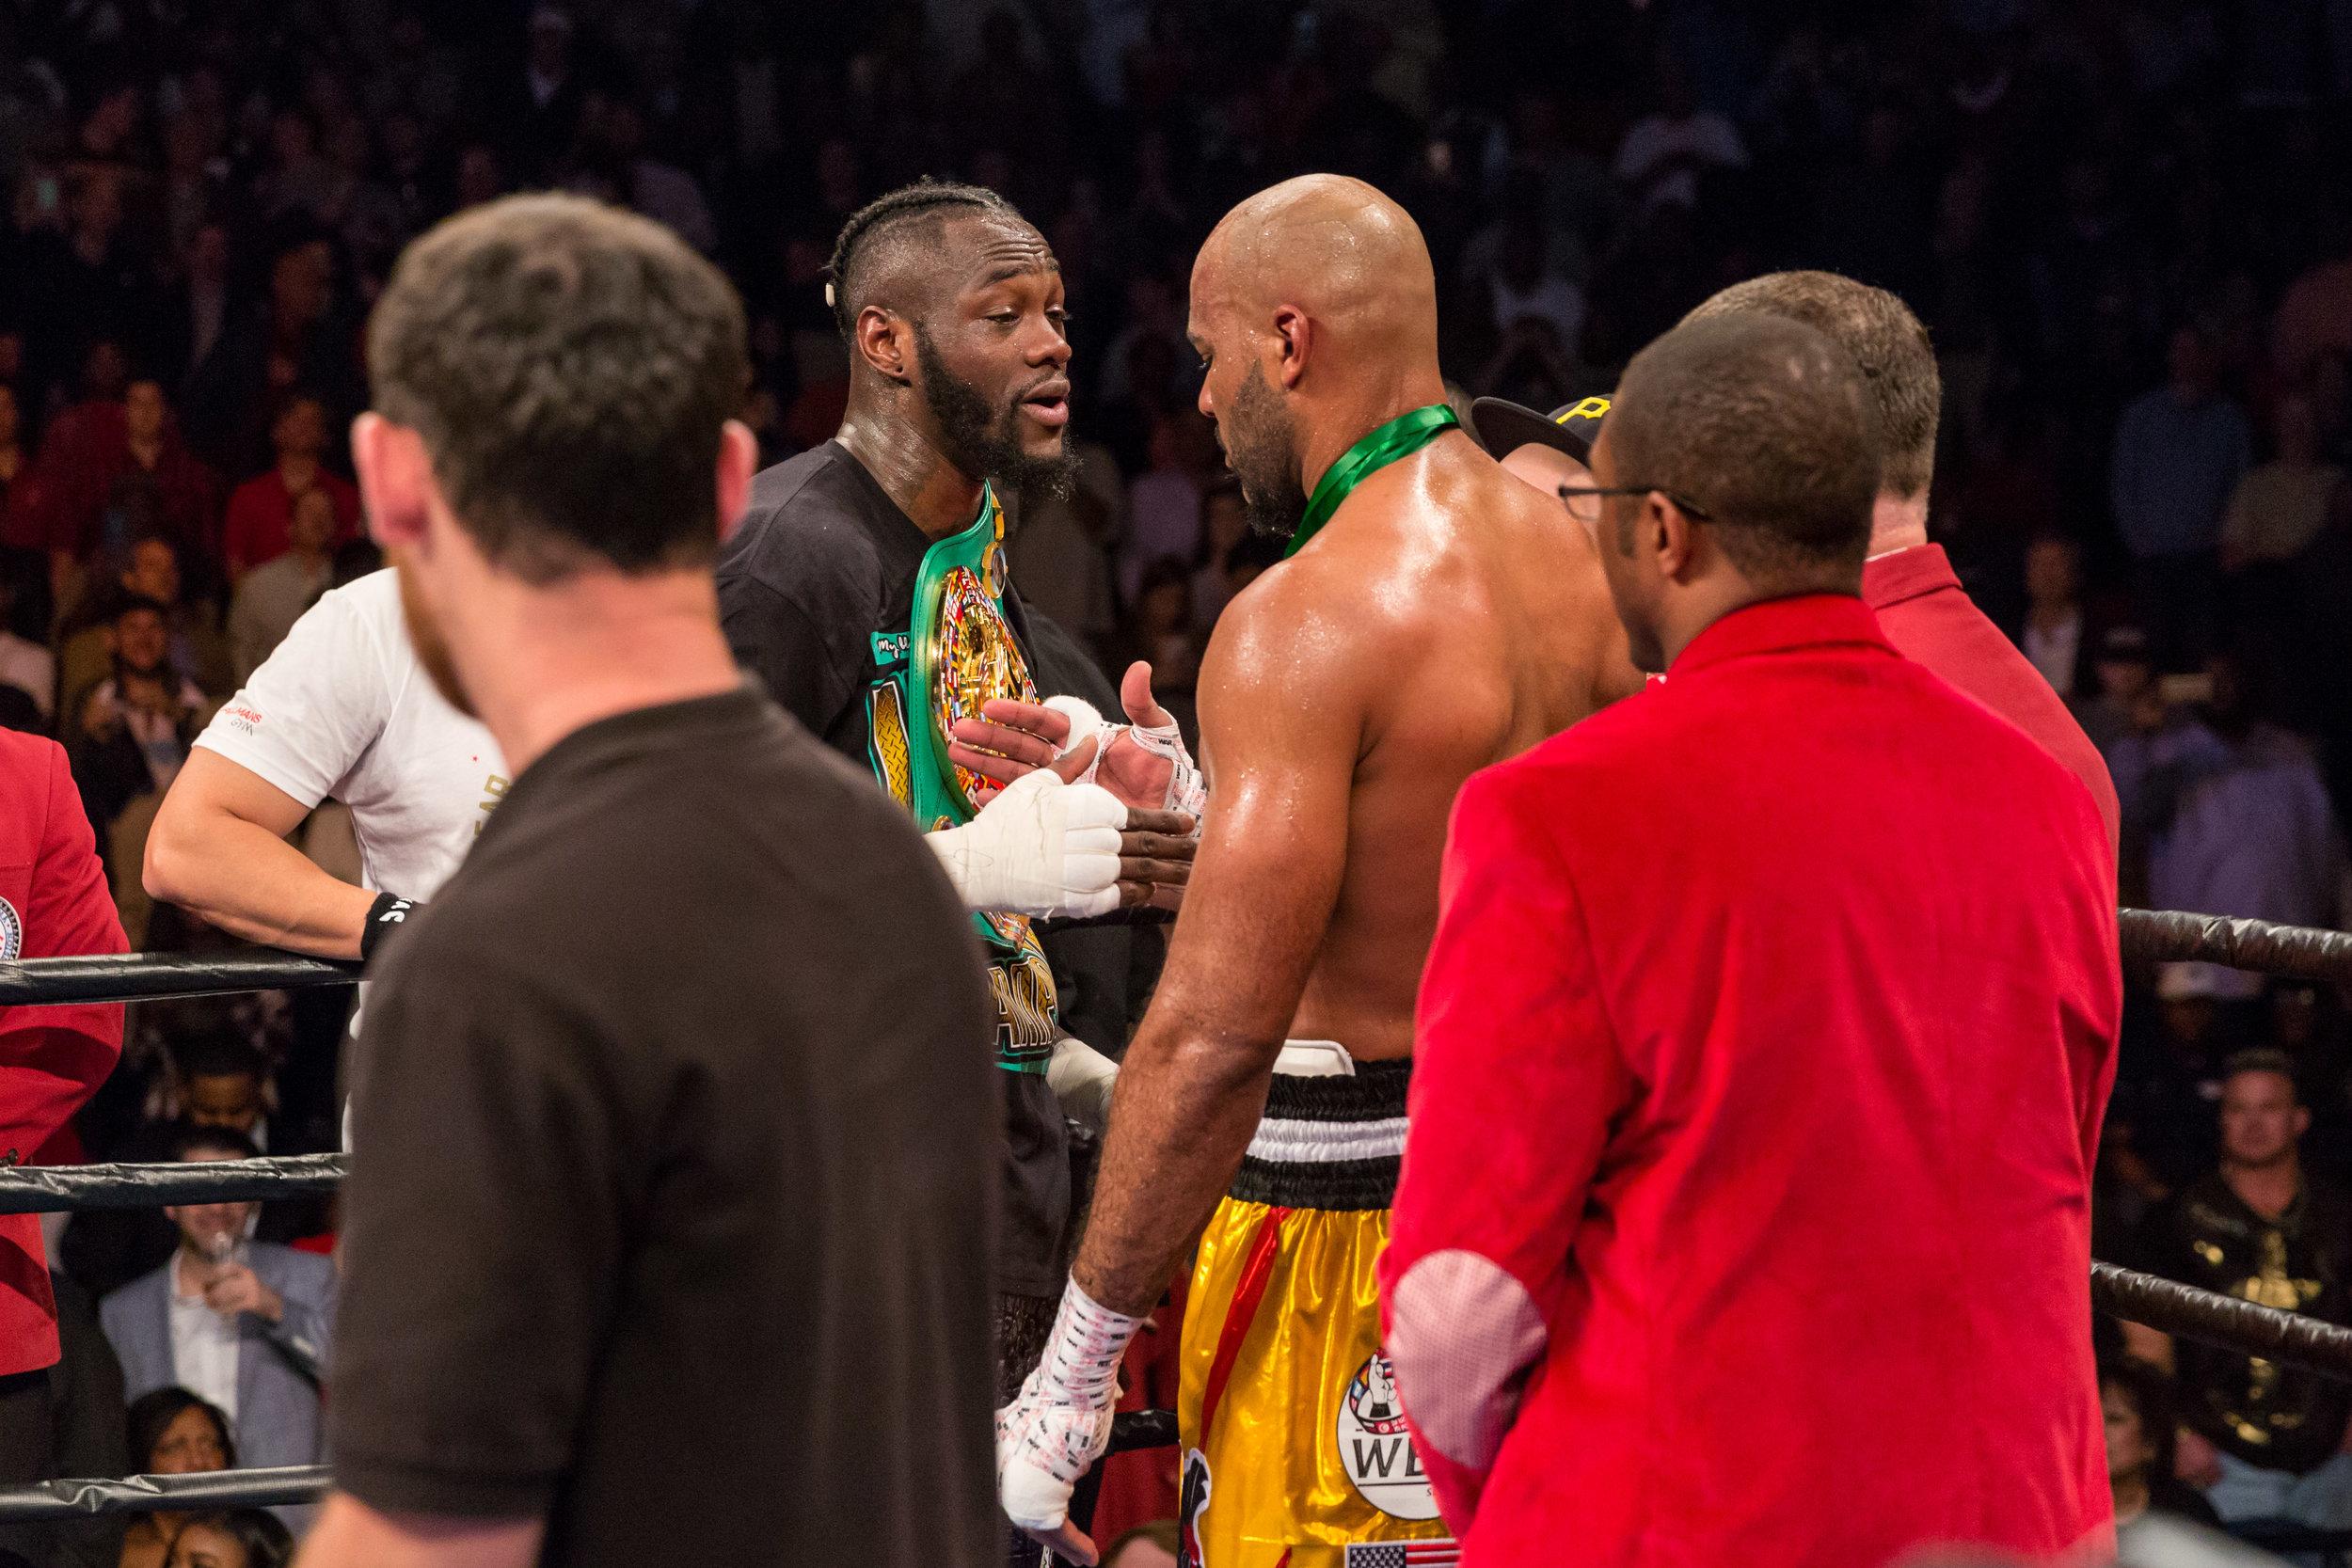 Deontay Wilder vs Gerald Washington - February 25_ 2017_02_25_2017_Fight_Ryan Hafey _ Premier Boxing Champions18.jpg